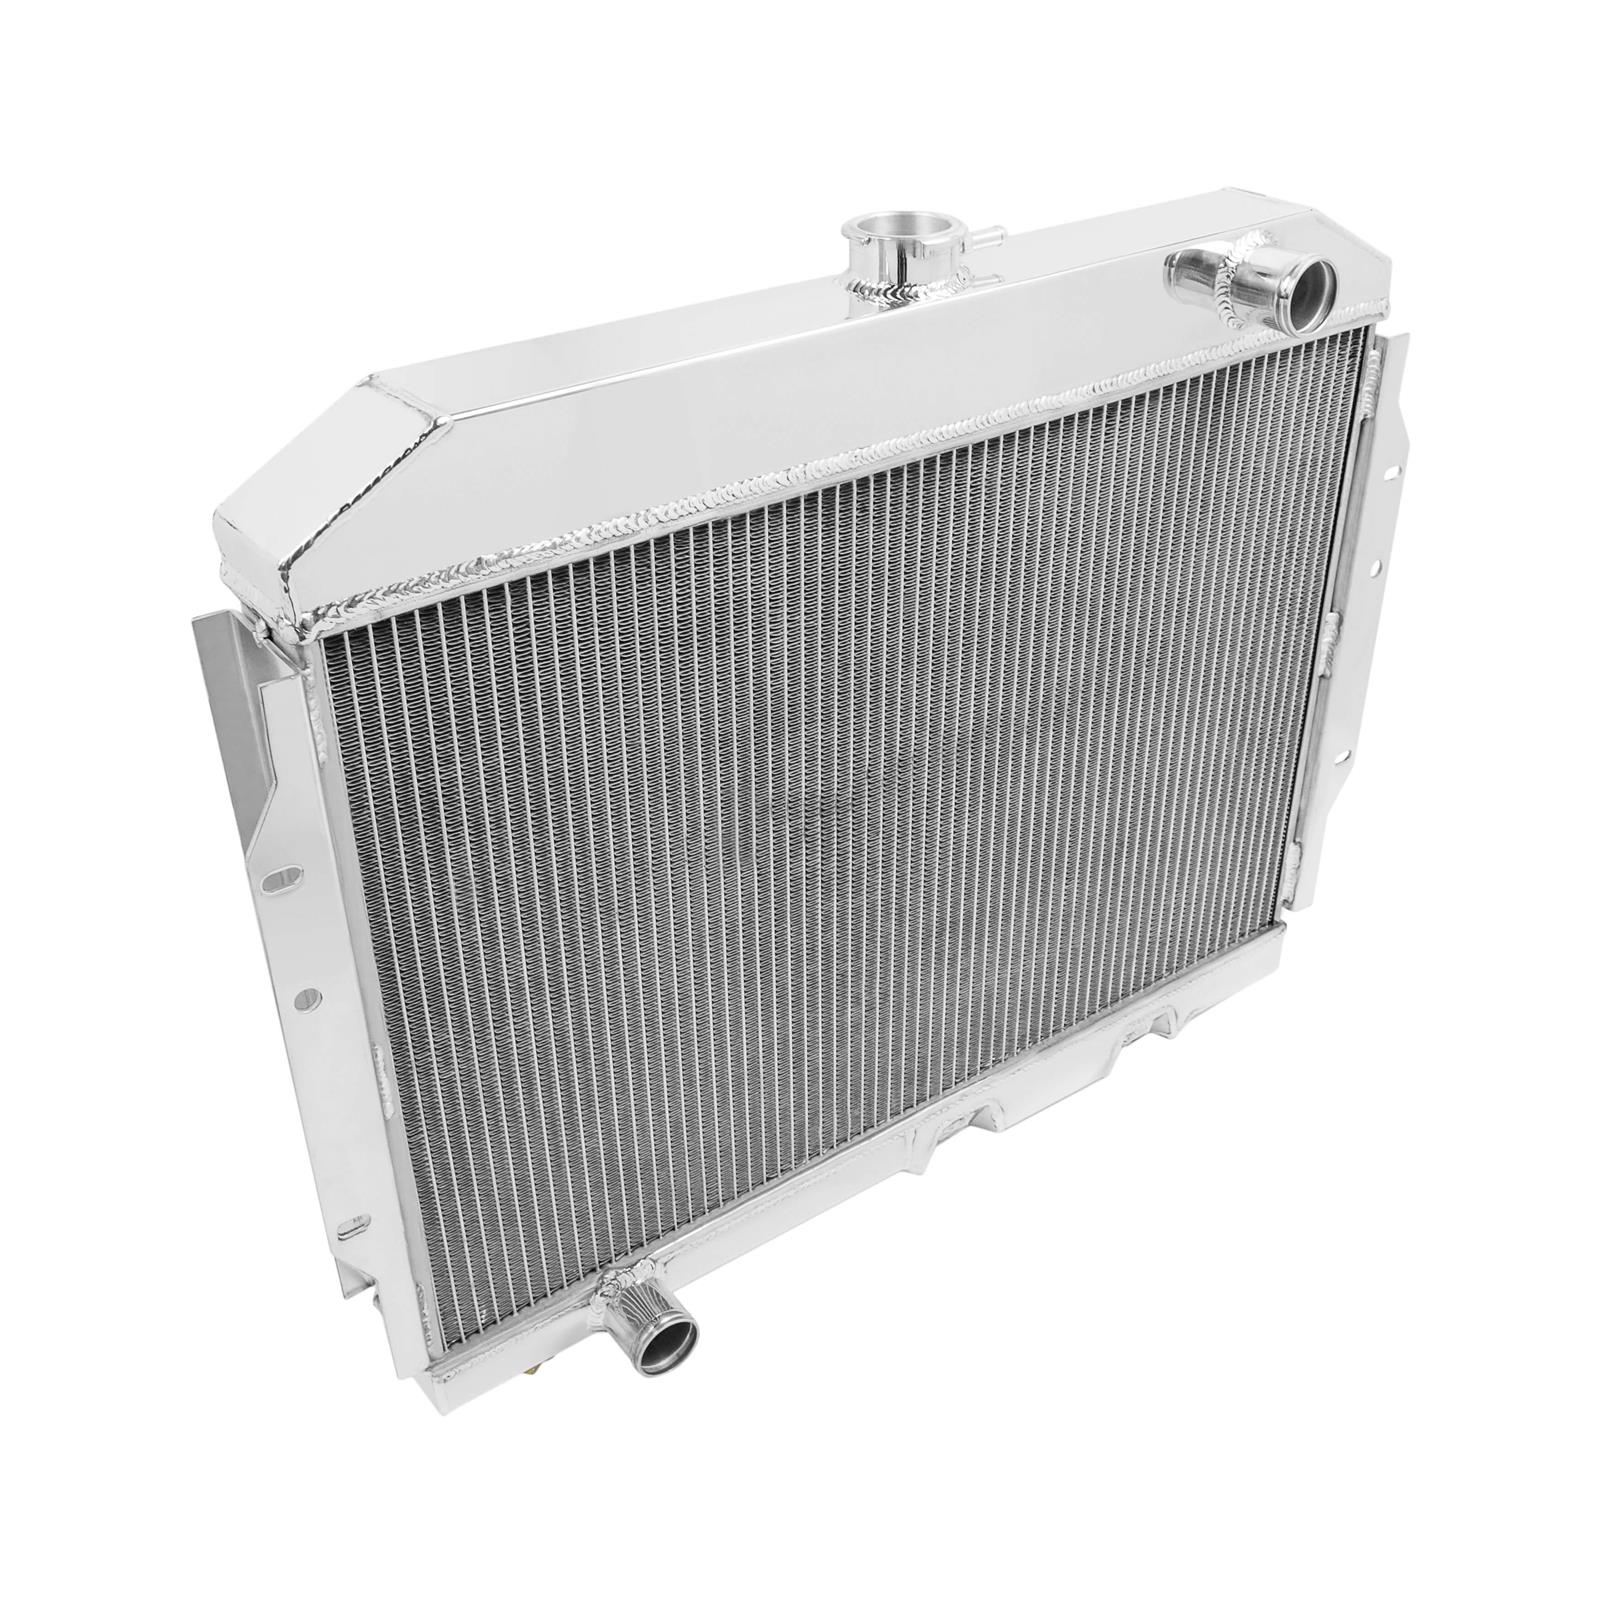 Fits 1994-1998 Mit Galant 2.4 Aluminum Factory Replacement Radiator DPI-2176